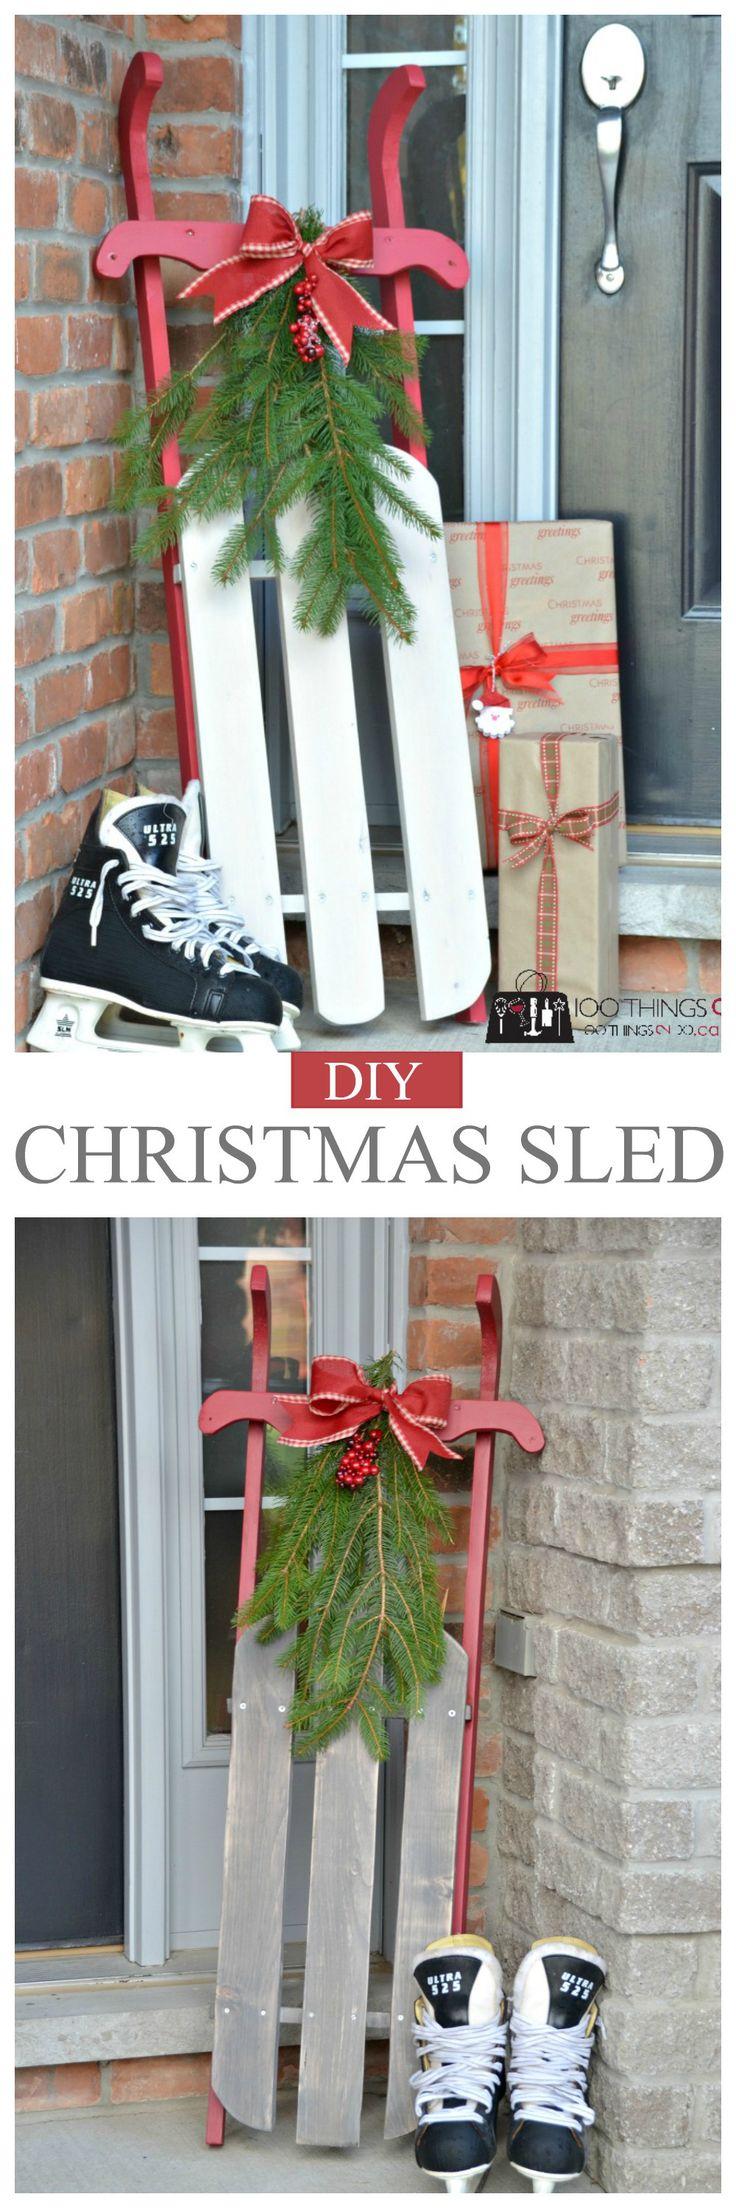 Best 25+ Christmas sled ideas on Pinterest